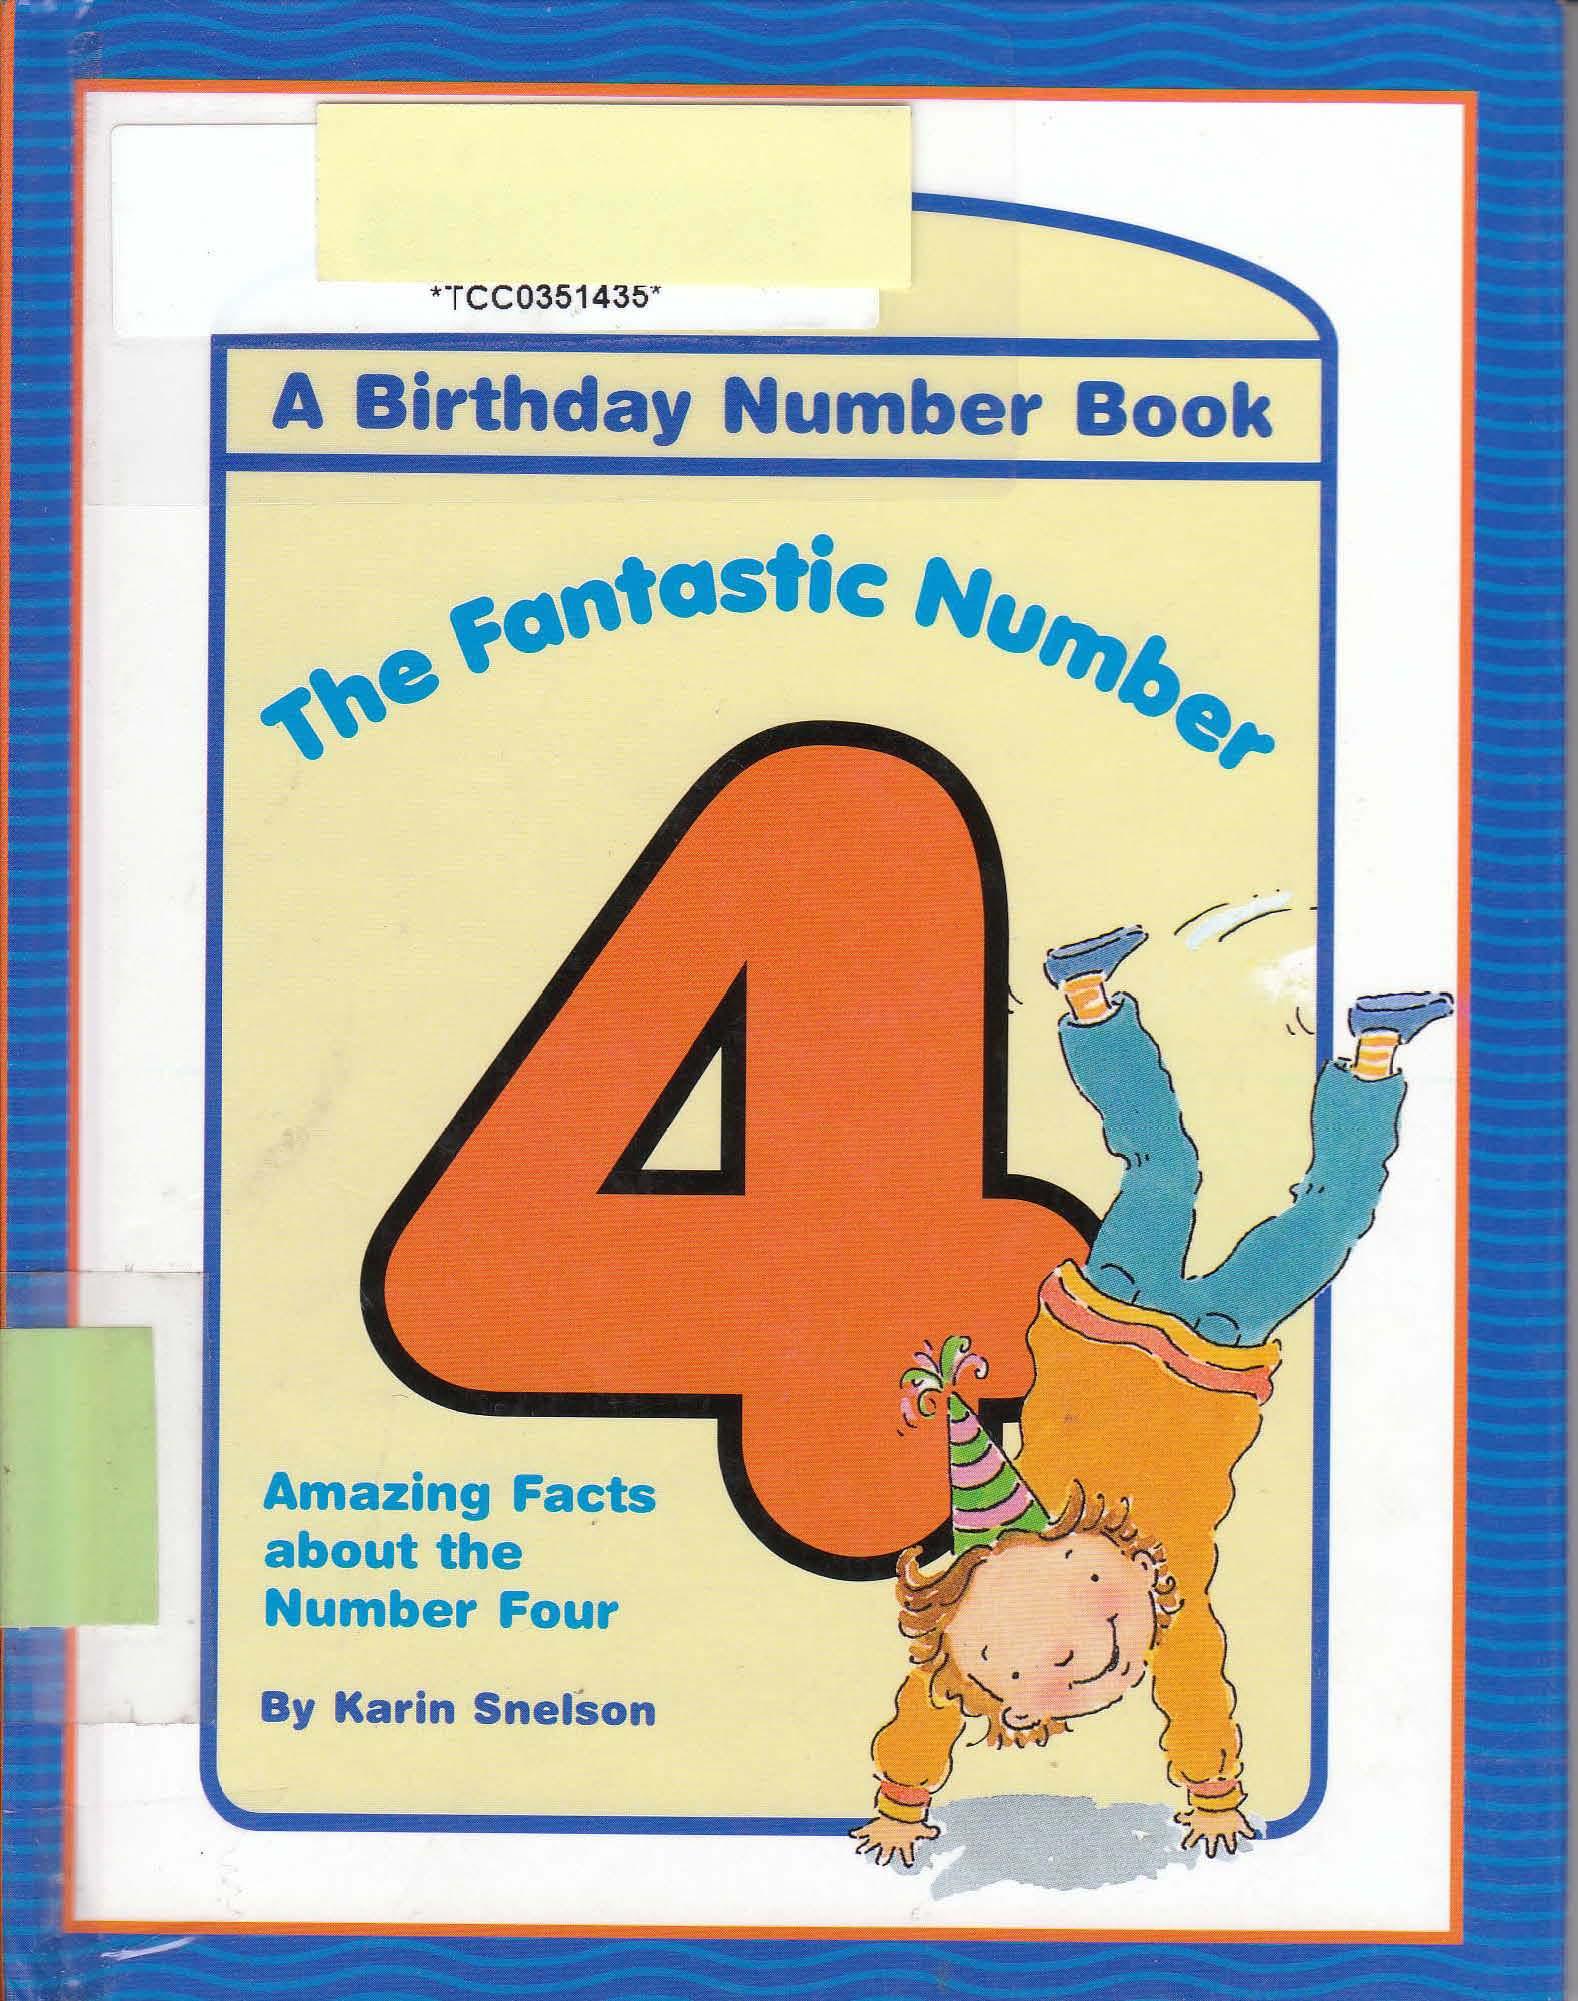 The Fantastic Number 4